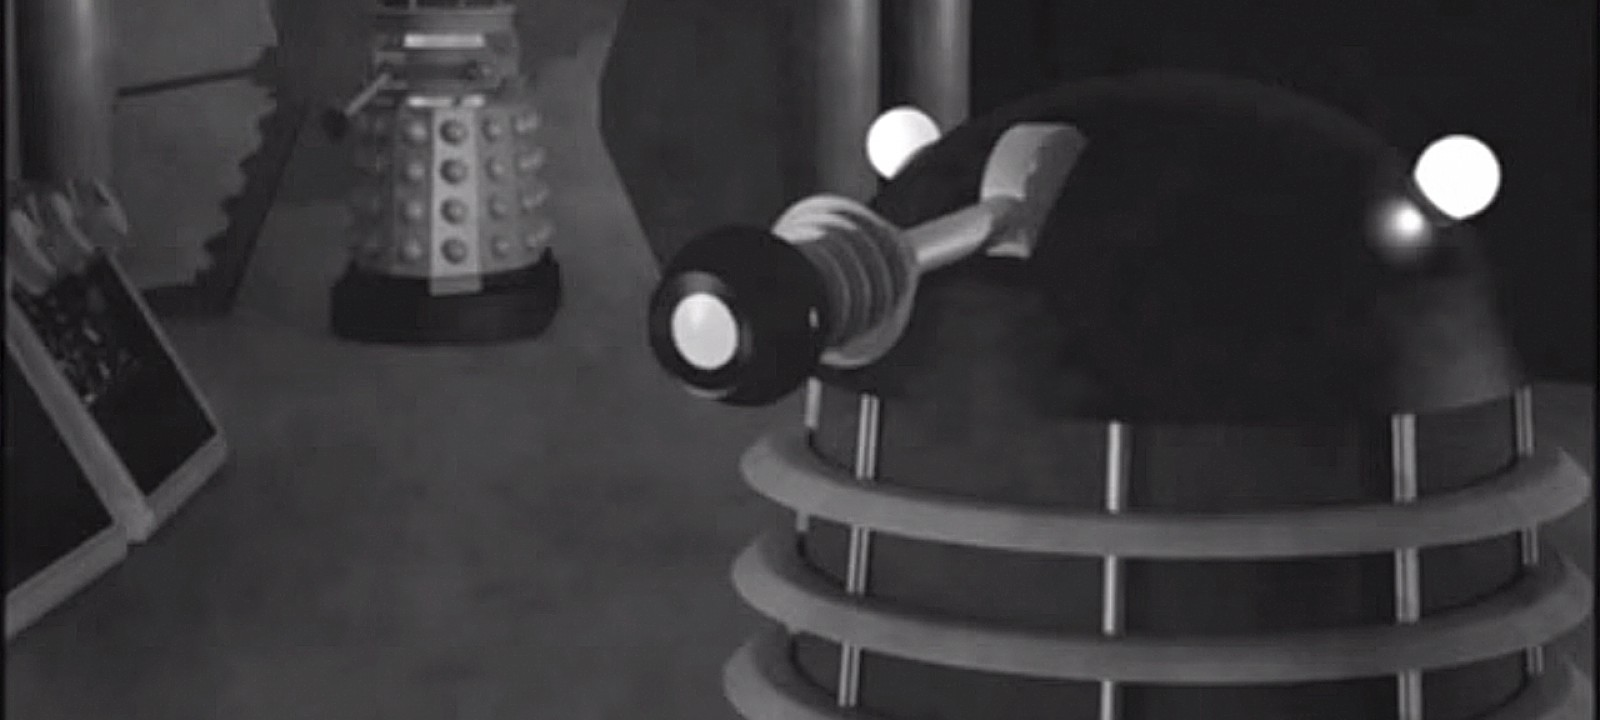 Daleks in 'The Quark Invasion of Earth' (Photo: Andrew Norton/YouTube)